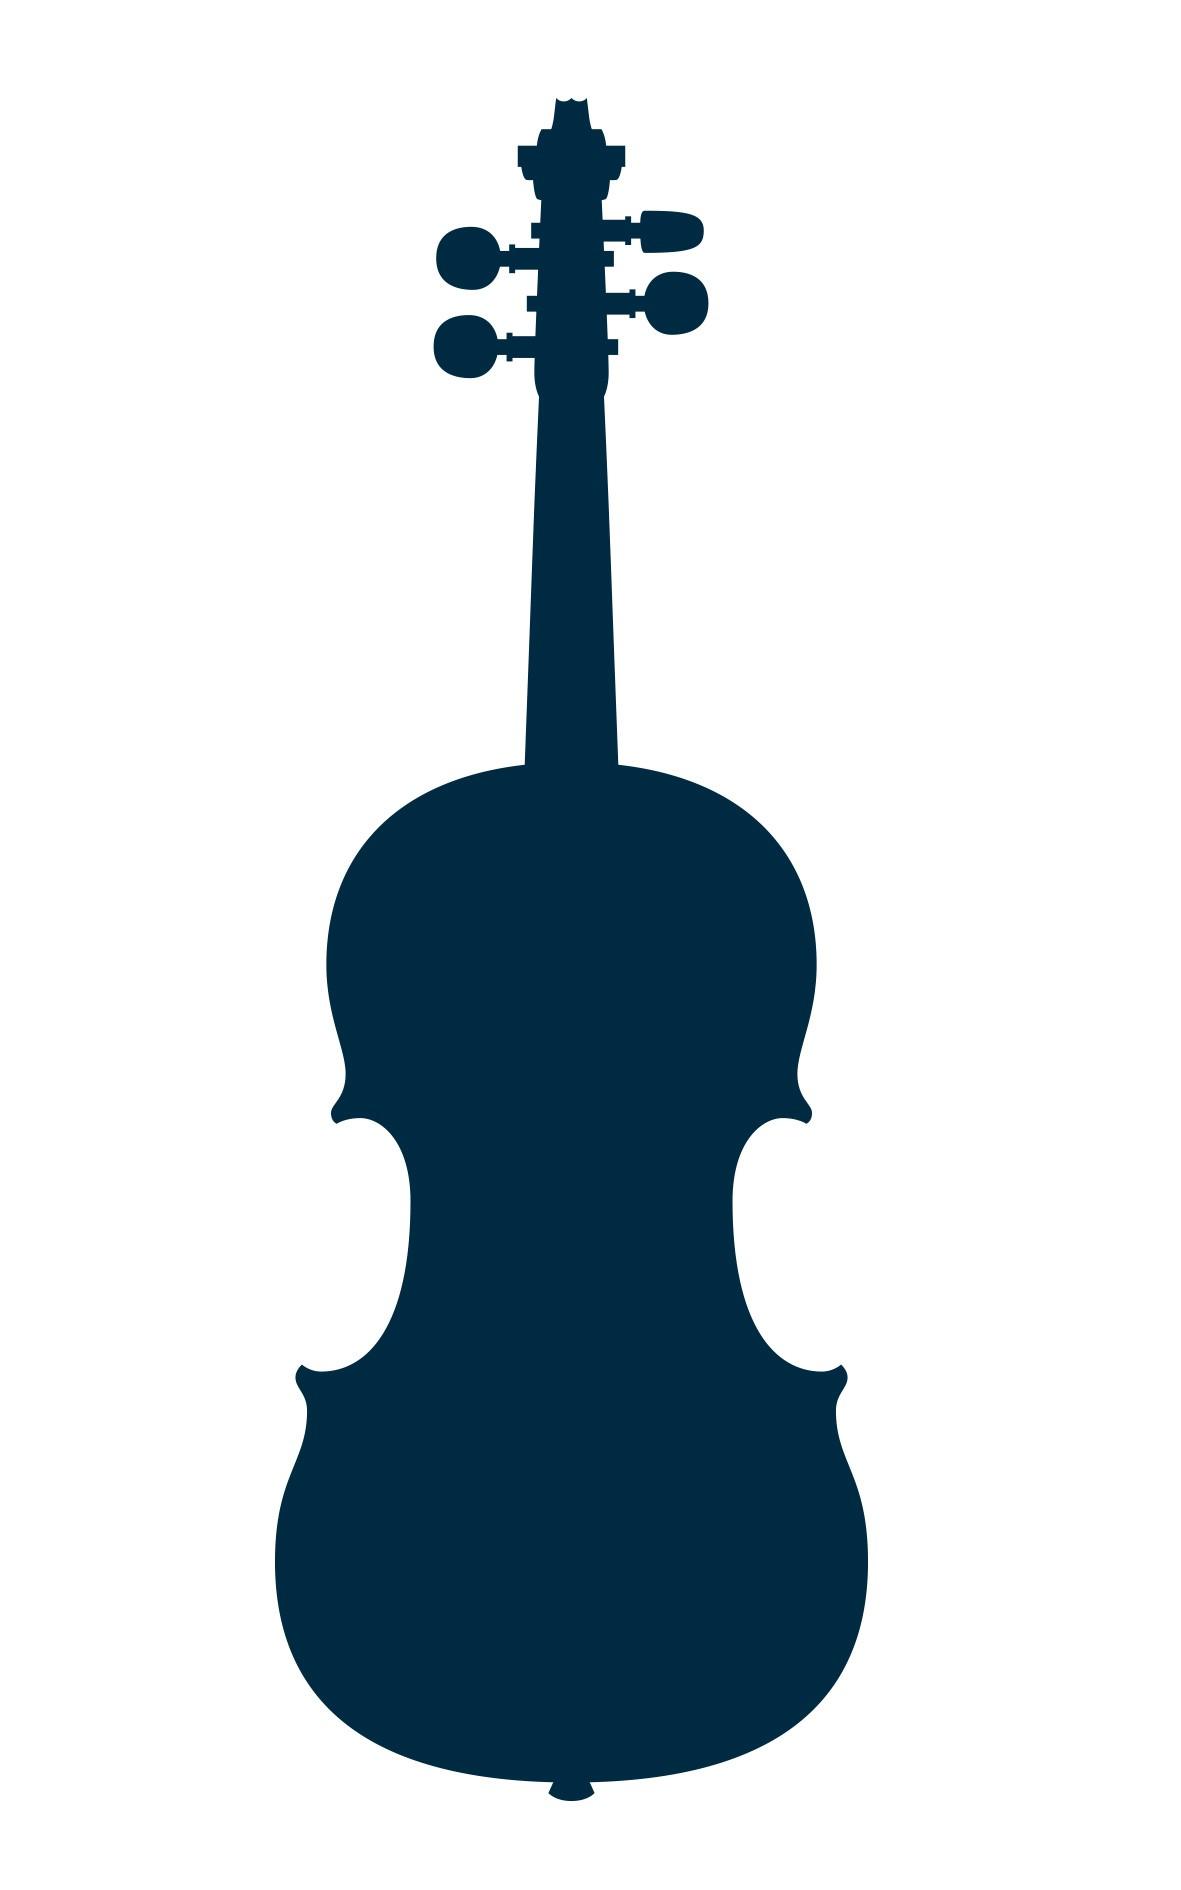 Scientific violin by Dr. Joseph Nagyvary